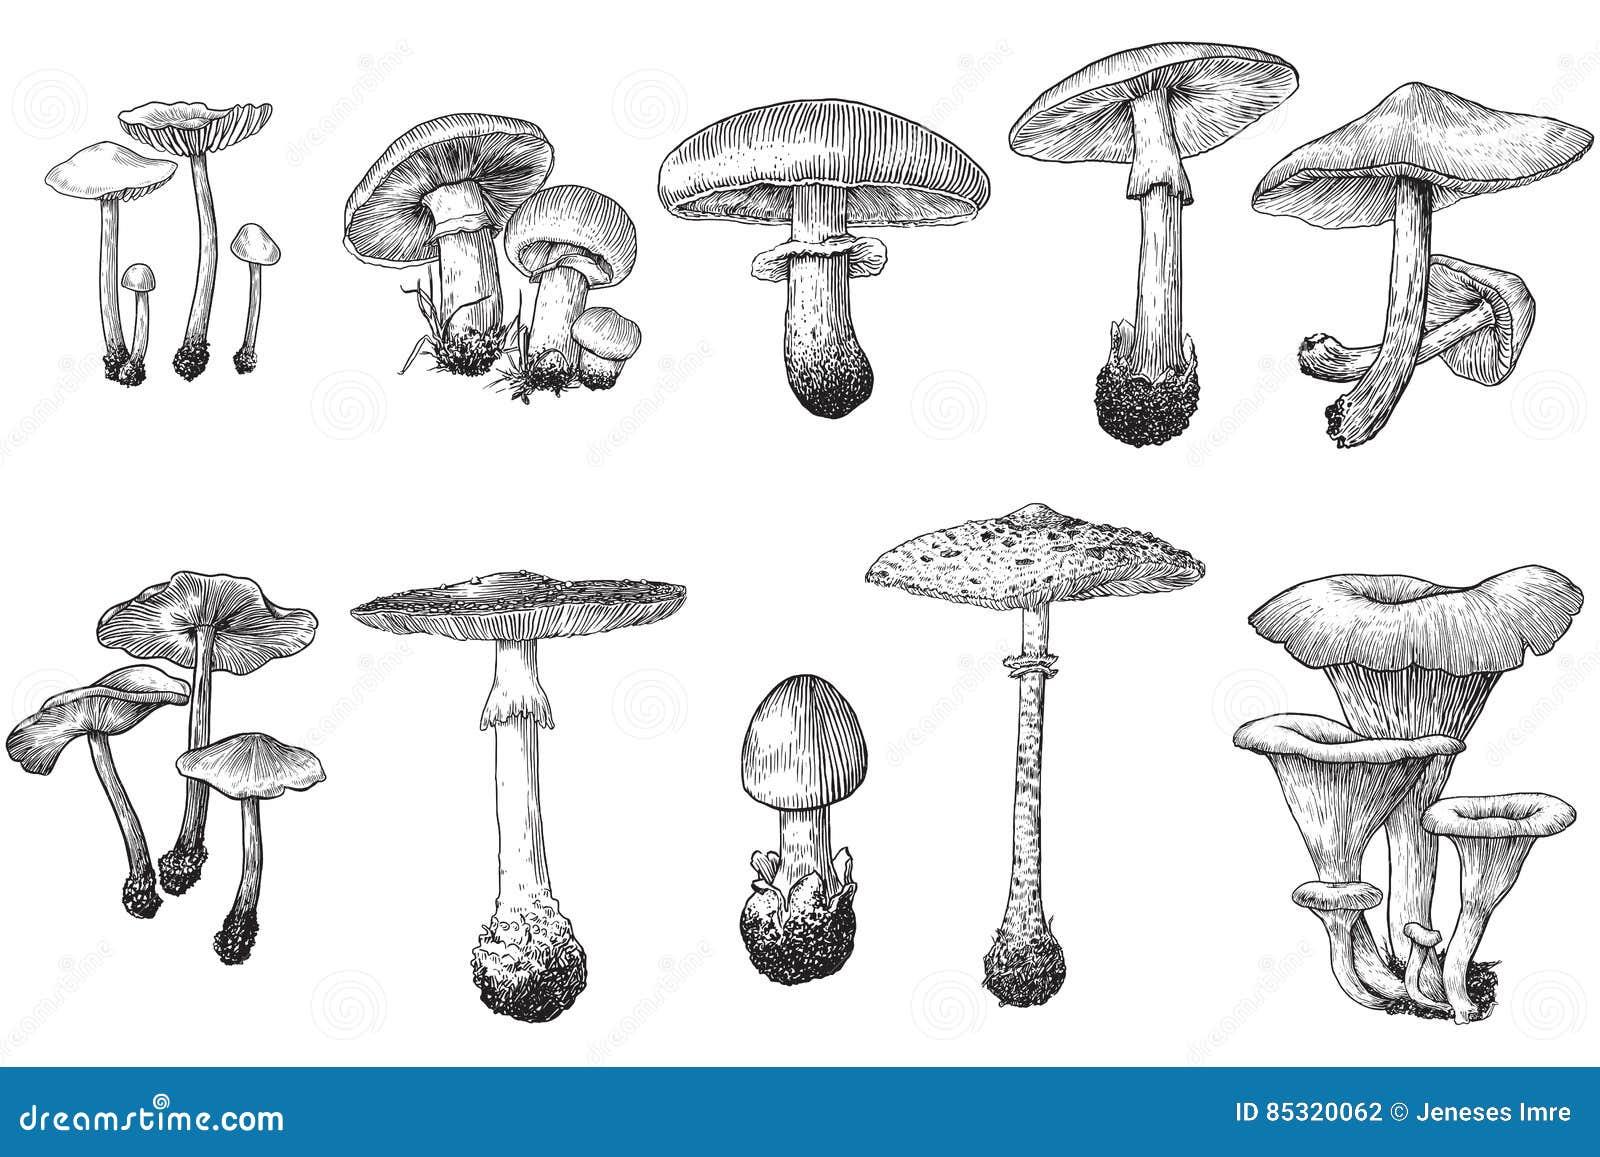 Mushroom Illustration Drawing Engraving Ink Line Art